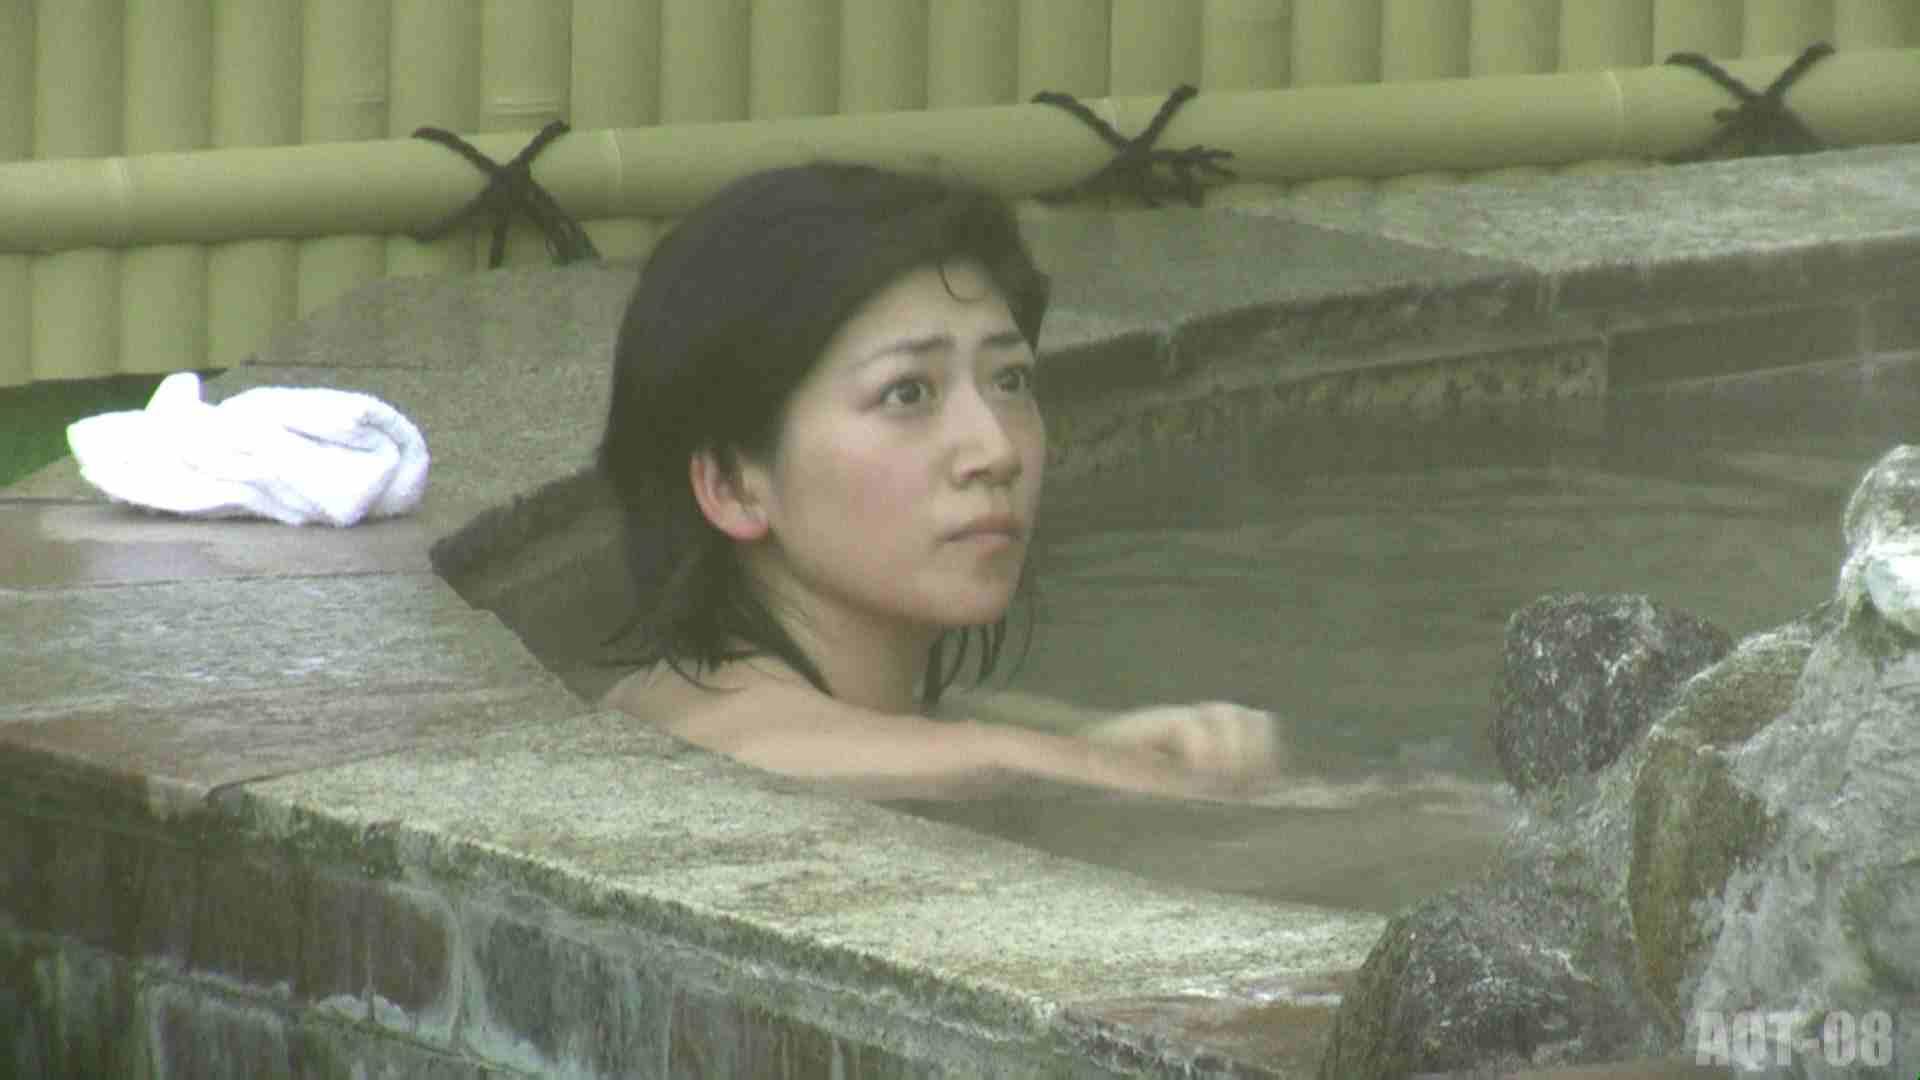 Aquaな露天風呂Vol.776 露天風呂編  75PIX 48